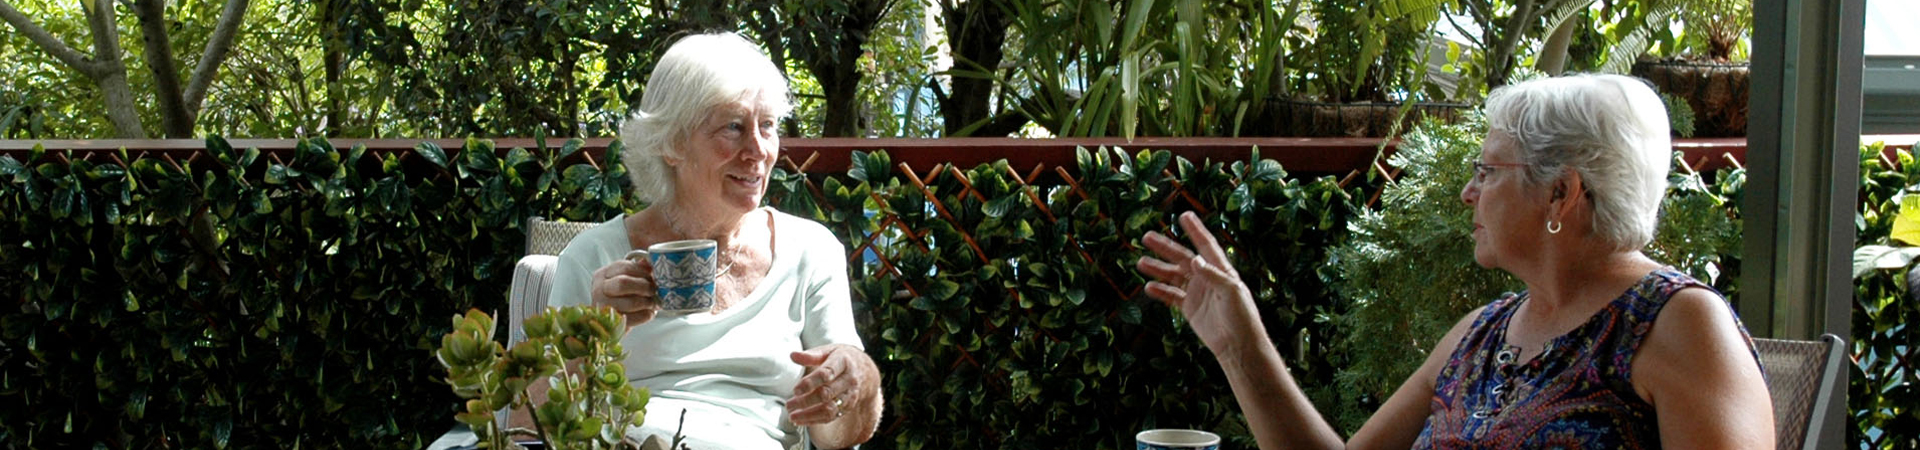 residents-chatting-in-garden